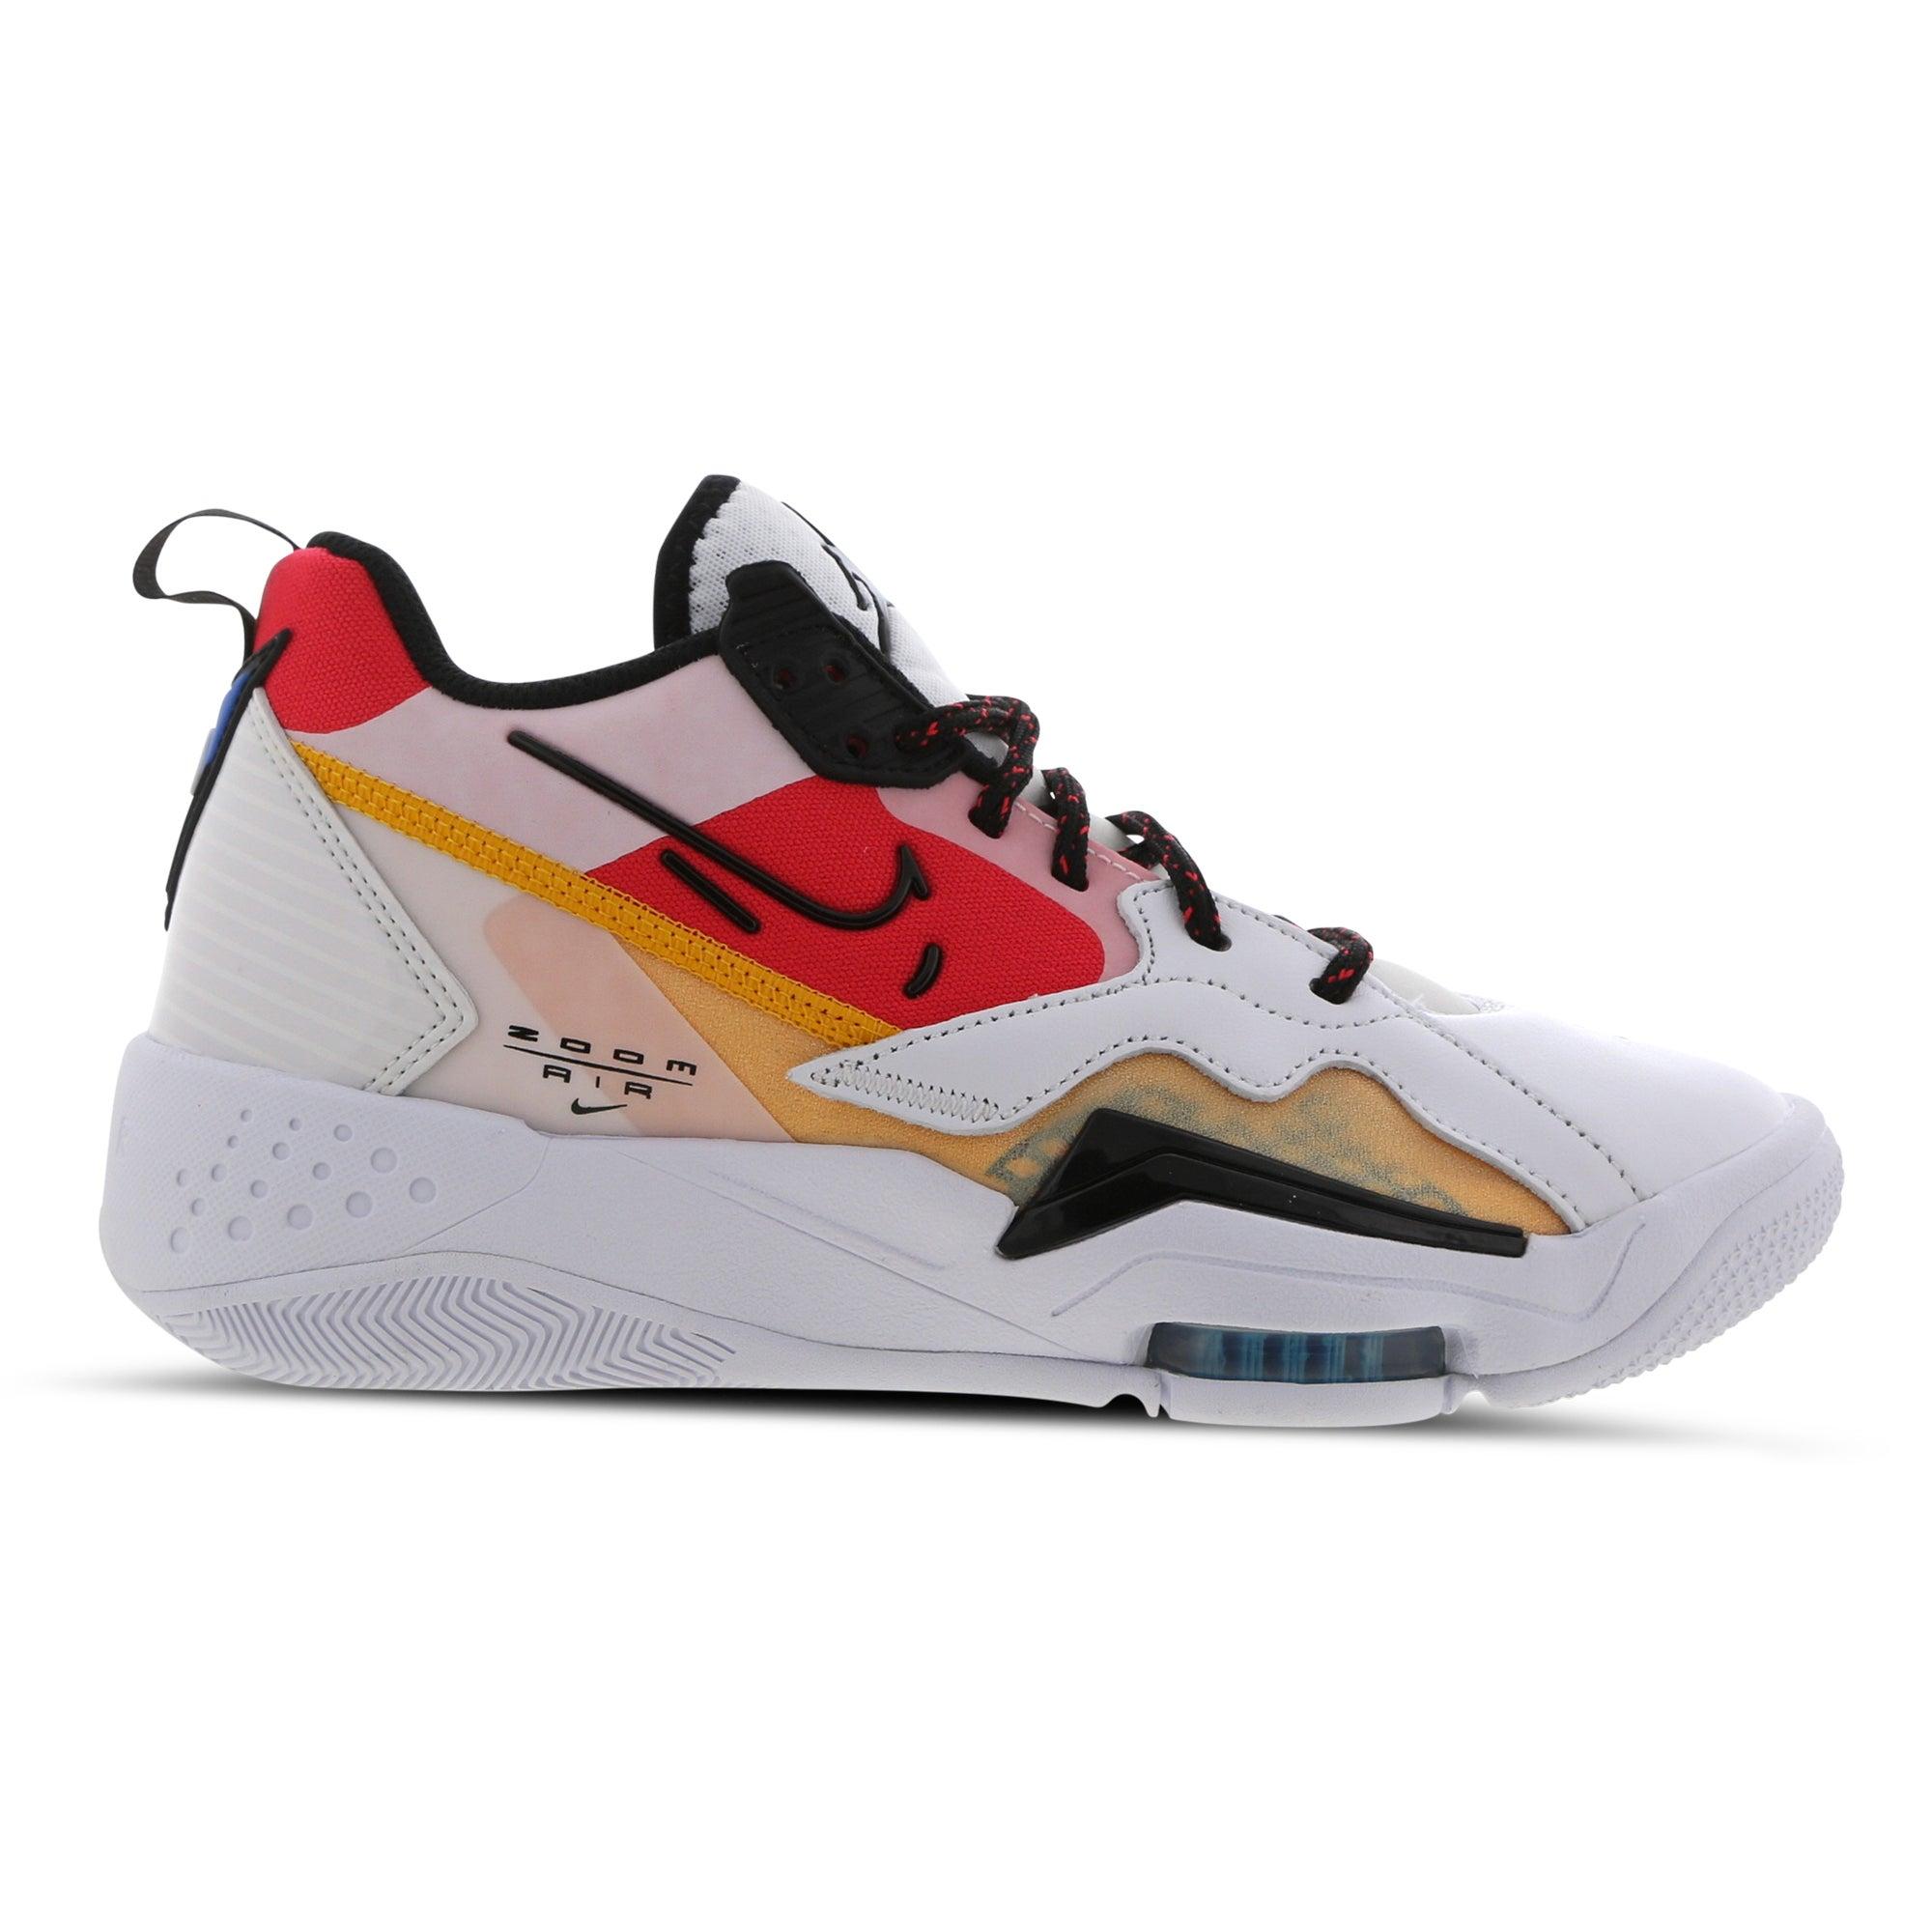 Jordan Zoom 92 Shoes